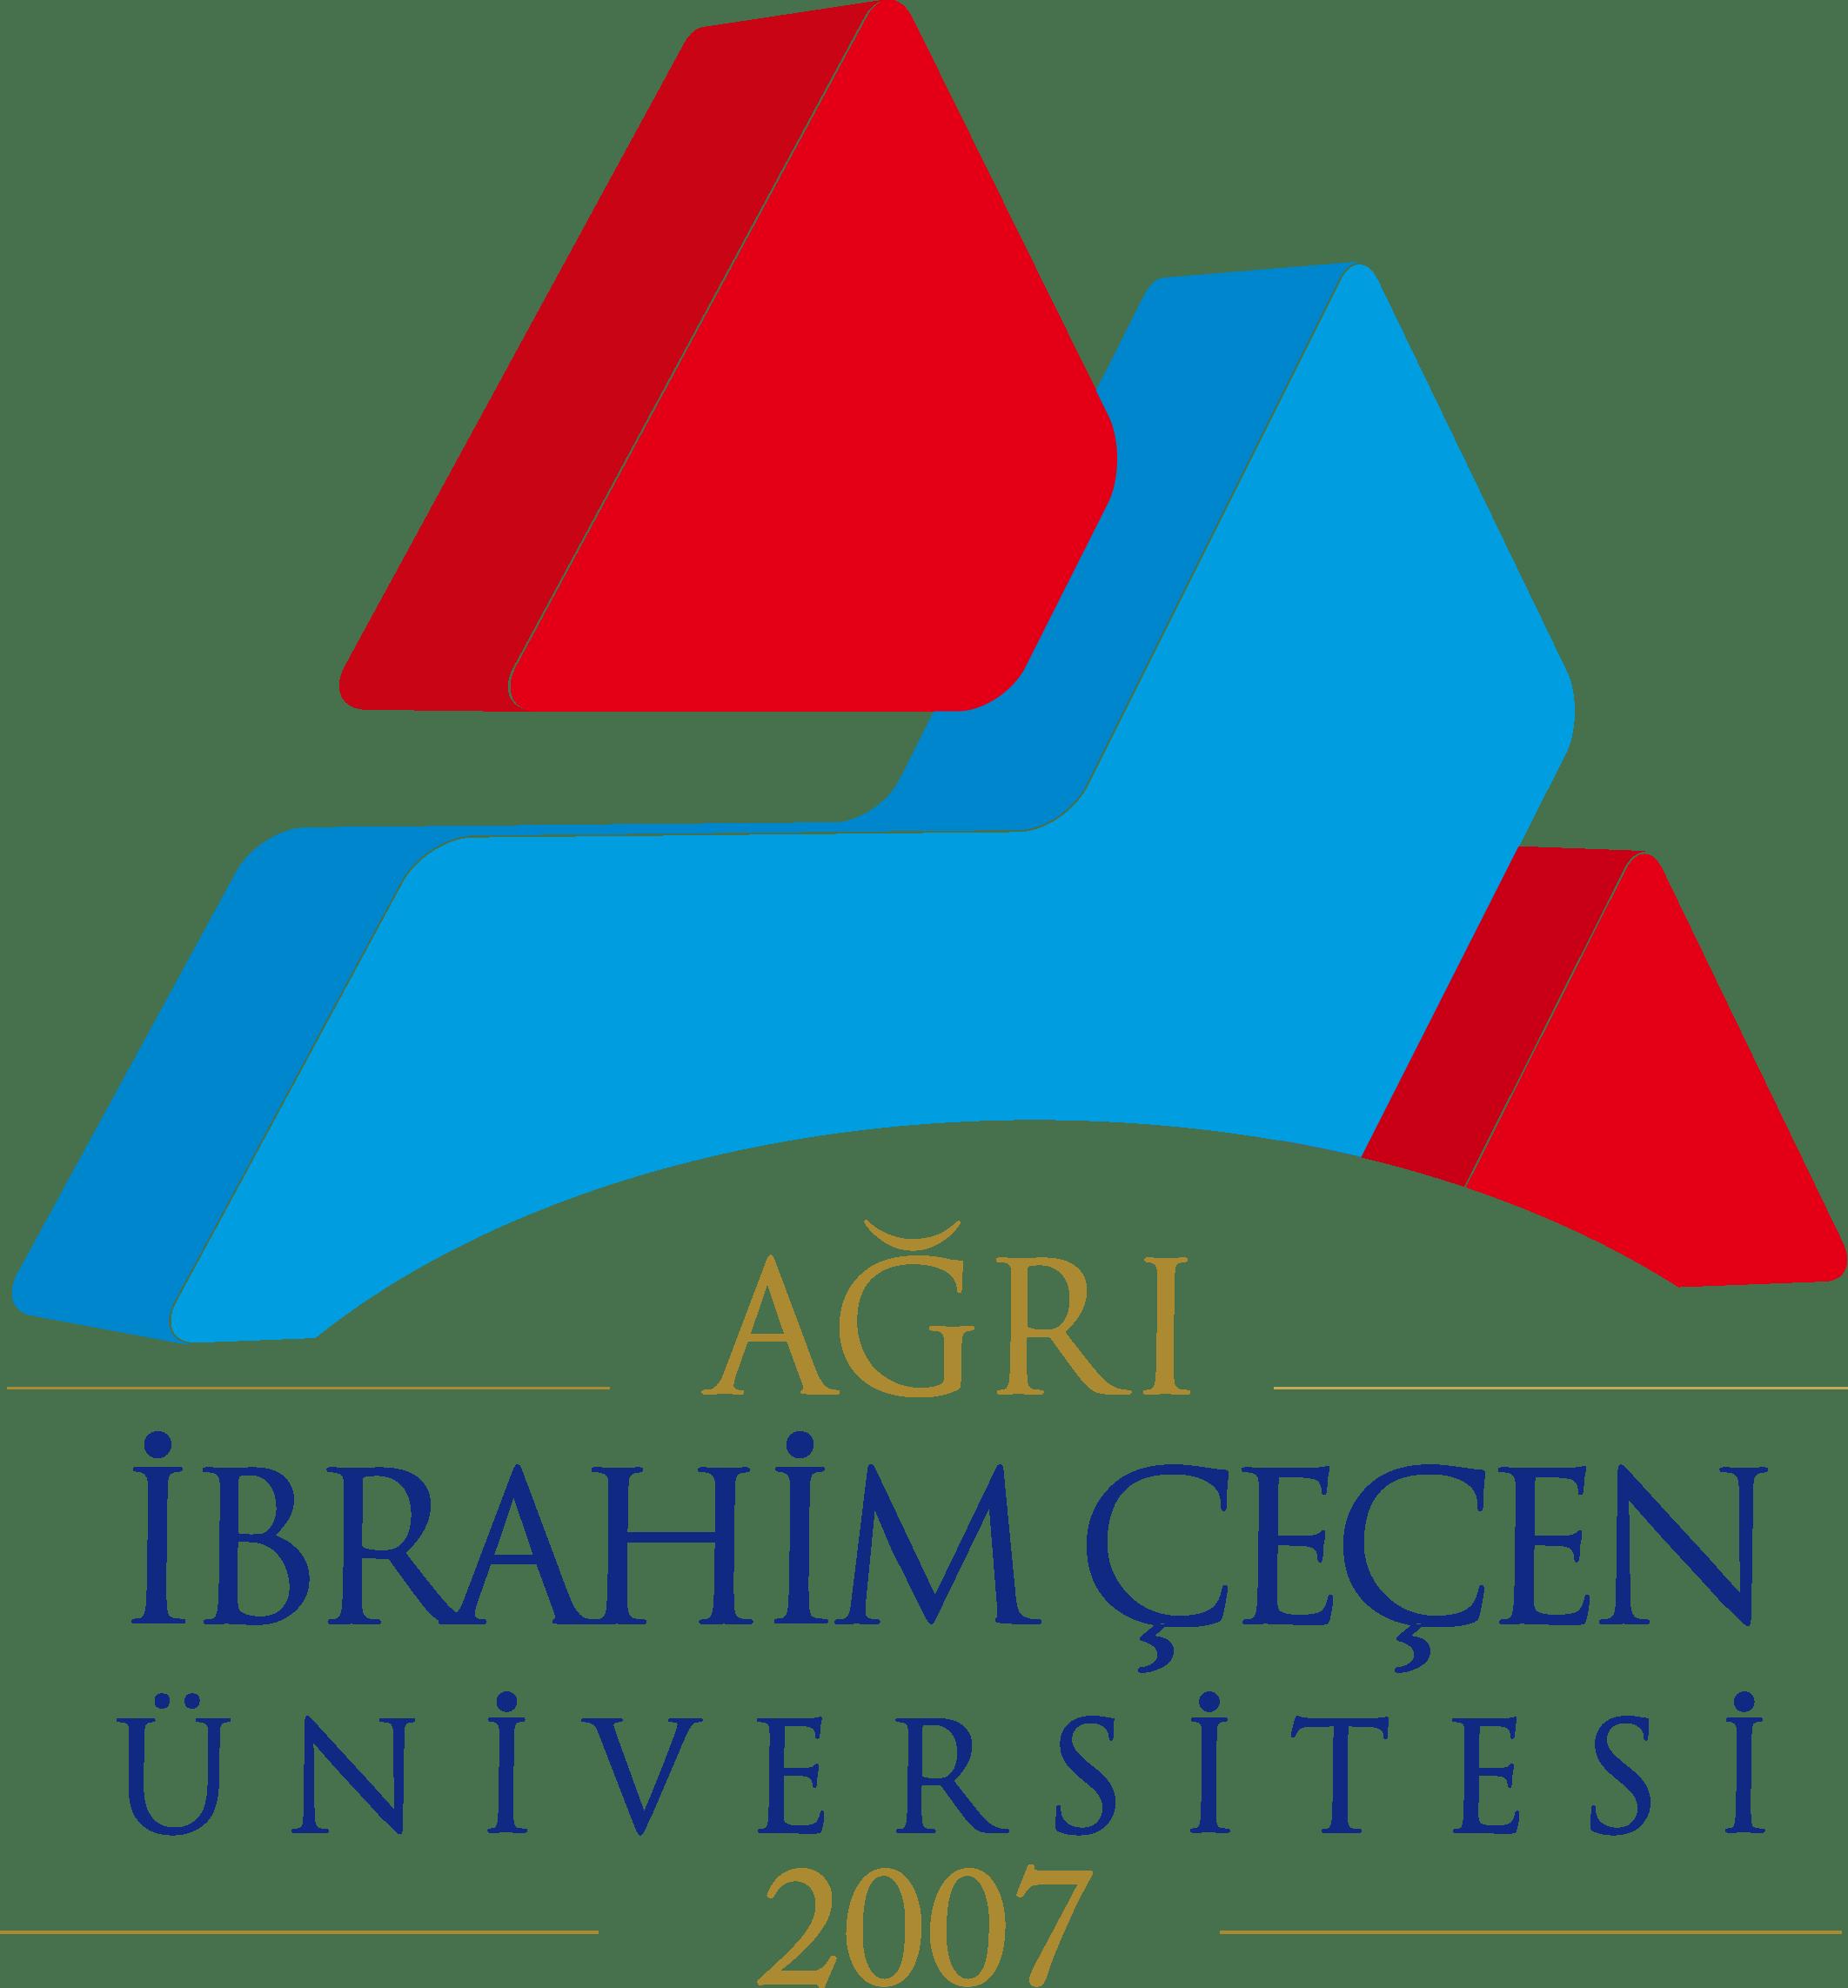 Ağrı İbrahim Çeçen Üniversitesi Logo   Amblem png